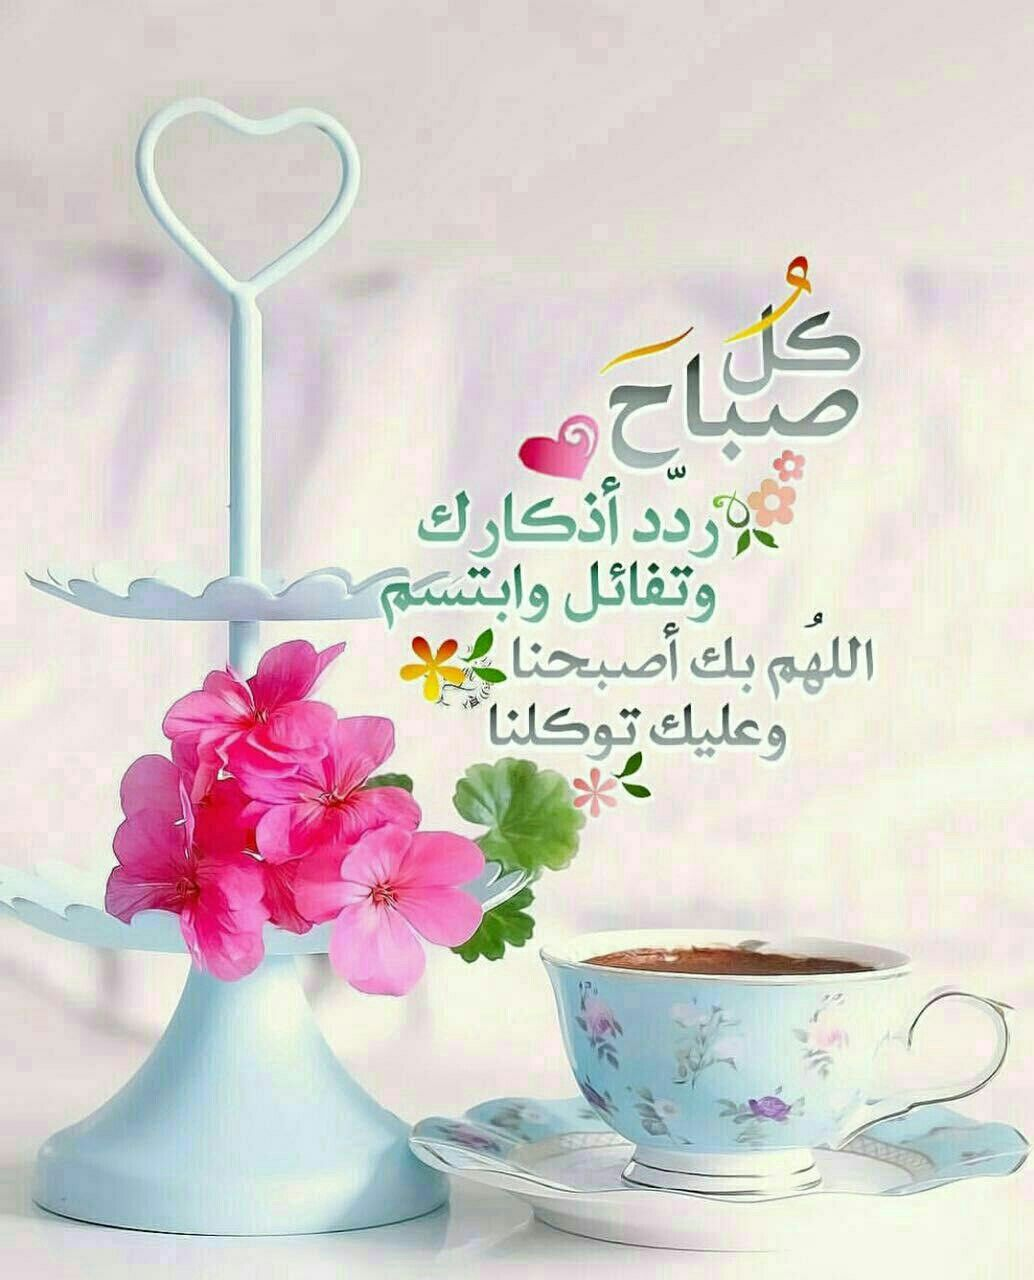 Pin By رحمة عبد الهادي On أجيب دعوة الداعي Flower Iphone Wallpaper Morning Greeting Place Card Holders